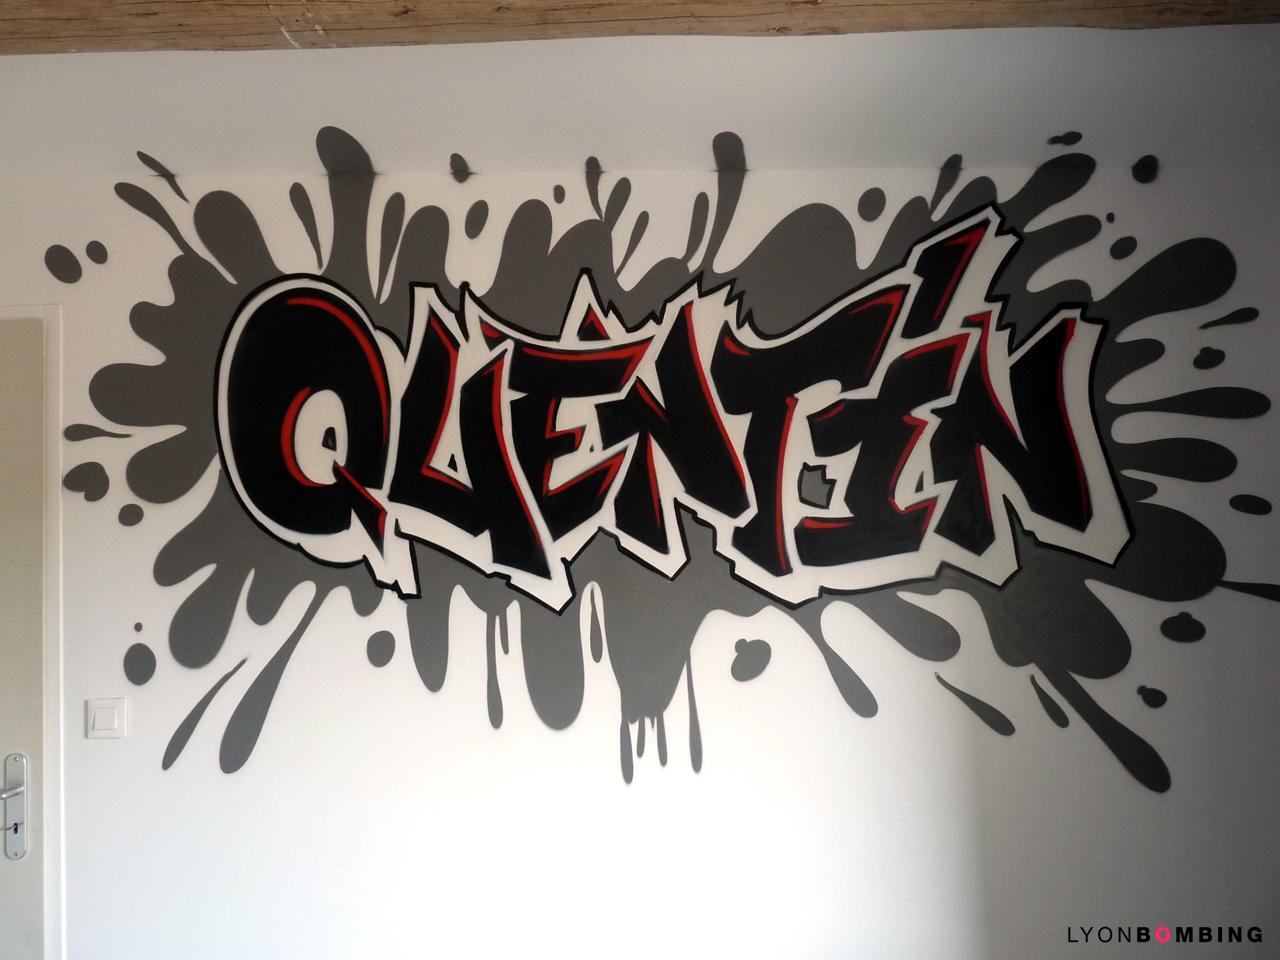 Pr nom graffiti dans chambre chambre lyonbombing - Graffiti prenom gratuit ...